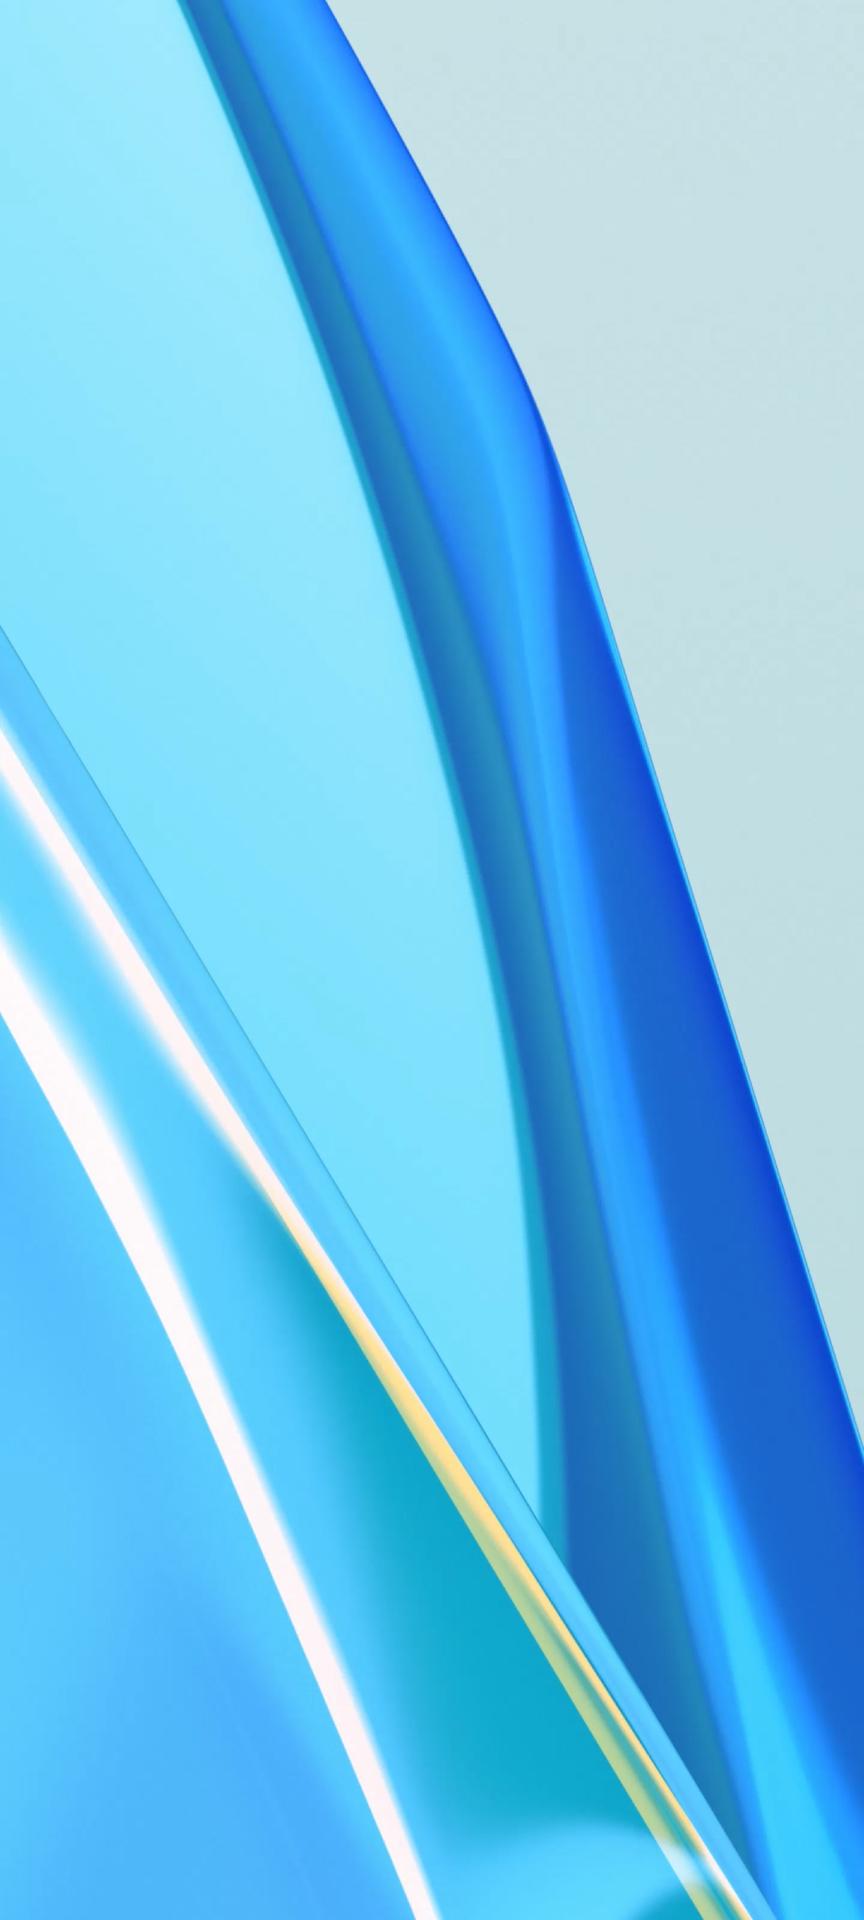 OnePlus 9 wallpaper 4